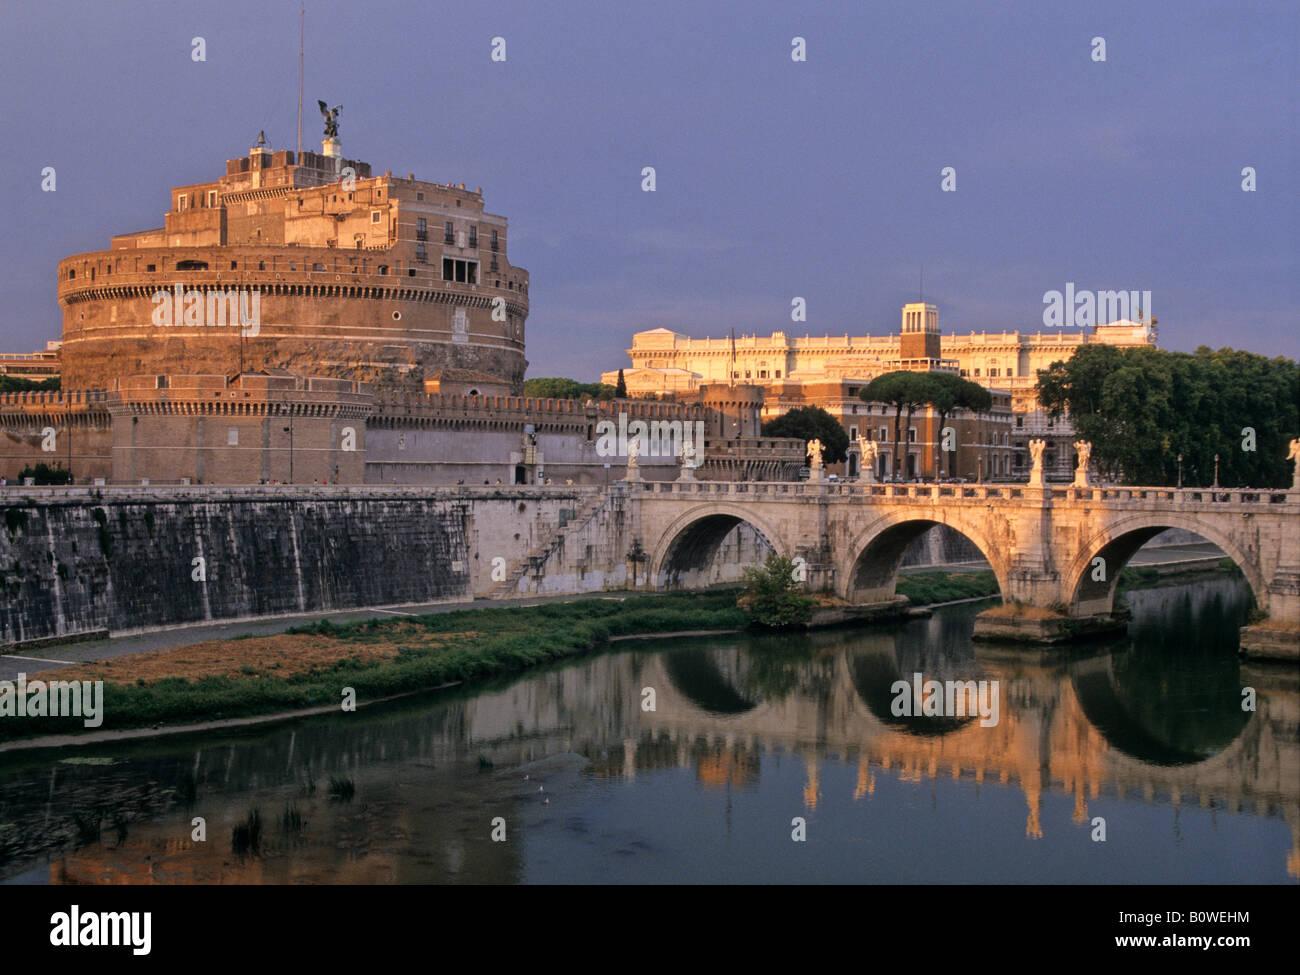 Angel's Castle, Angel's Bridge, Law Courts (back), Rome, Latium, Italy - Stock Image